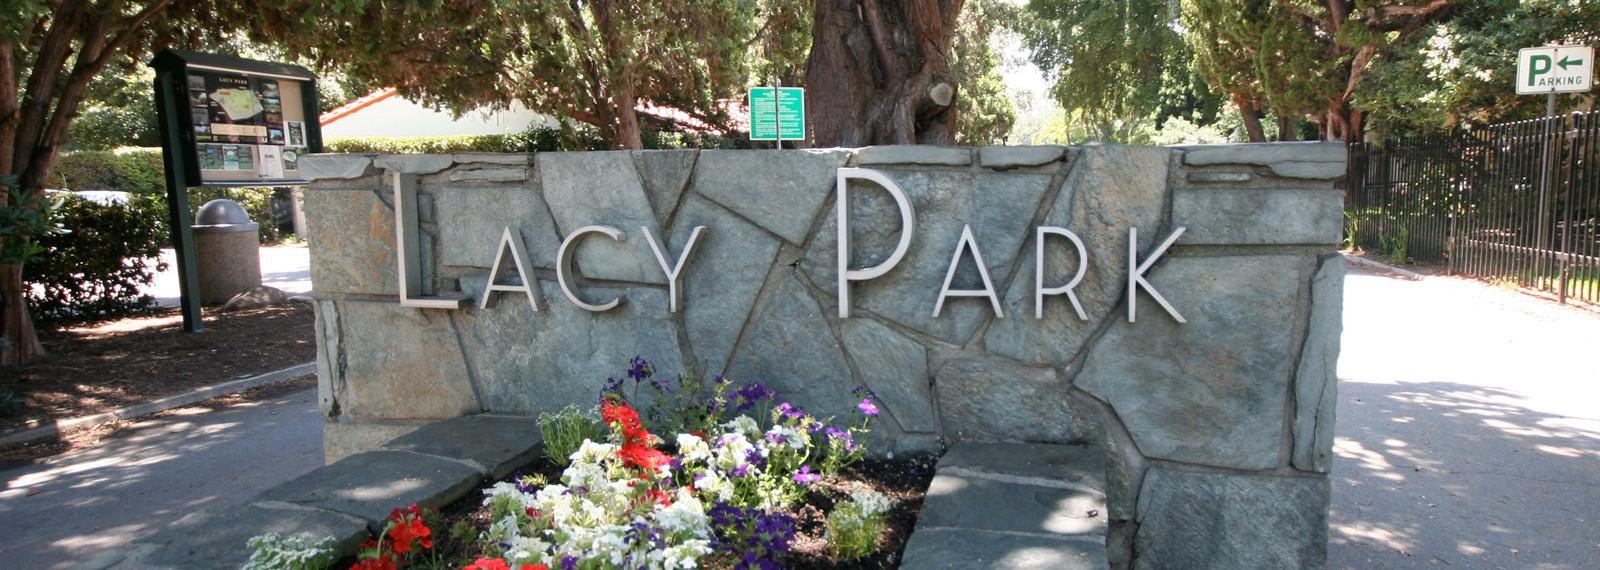 Lacy Park - Nina Kirkendall